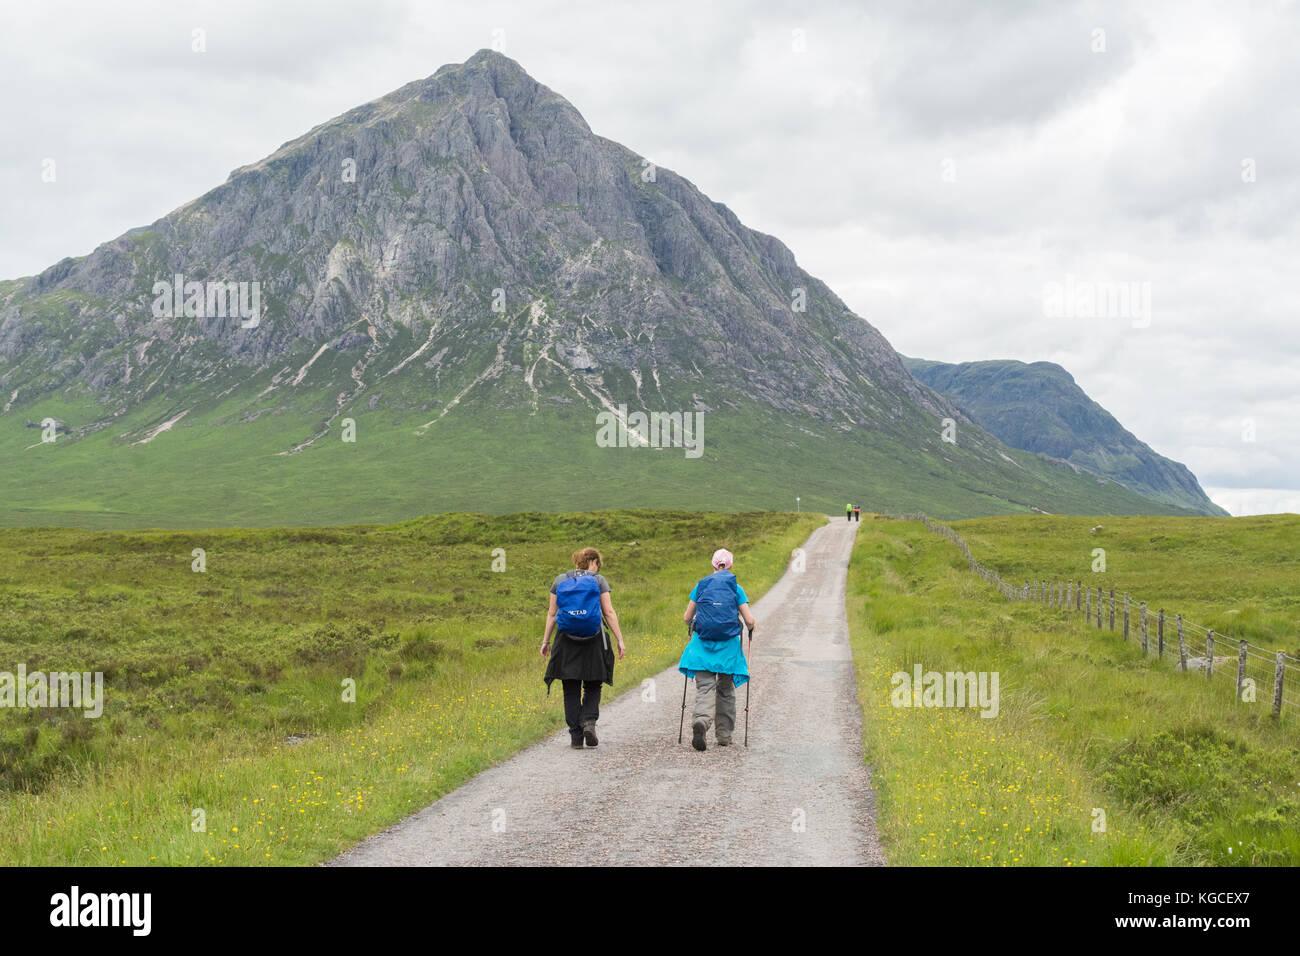 West Highland Way walkers walking towards Buachaille Etive Mor,  Glen Coe, Scotland, UK - Stock Image